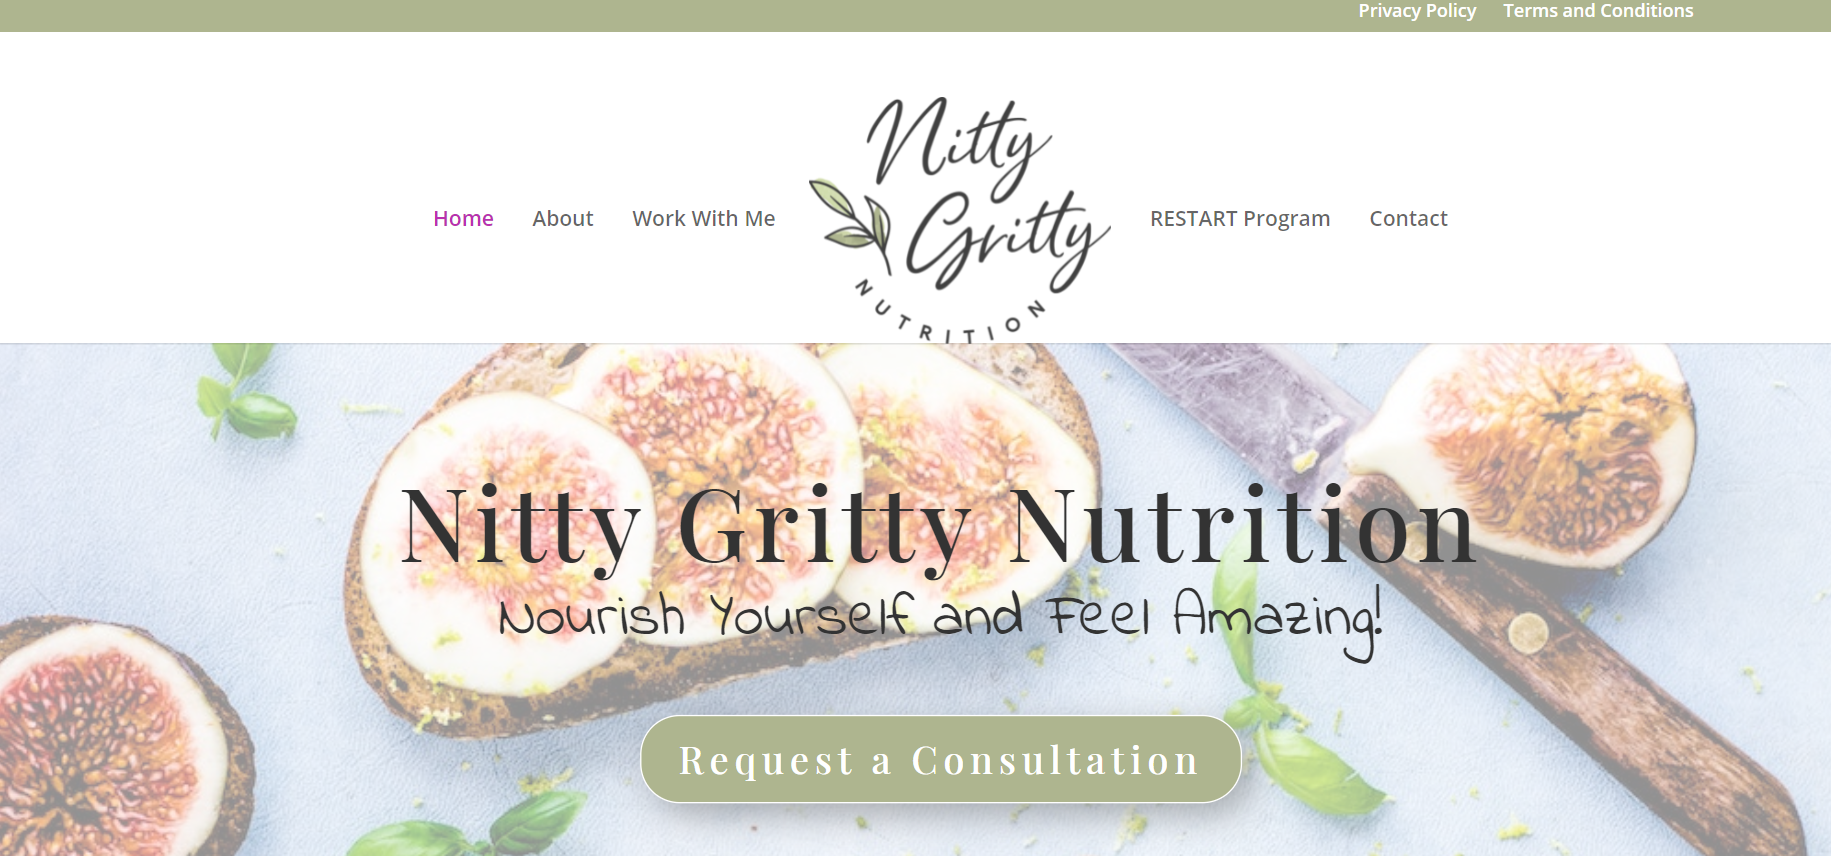 Nitty Gritty Nutrition